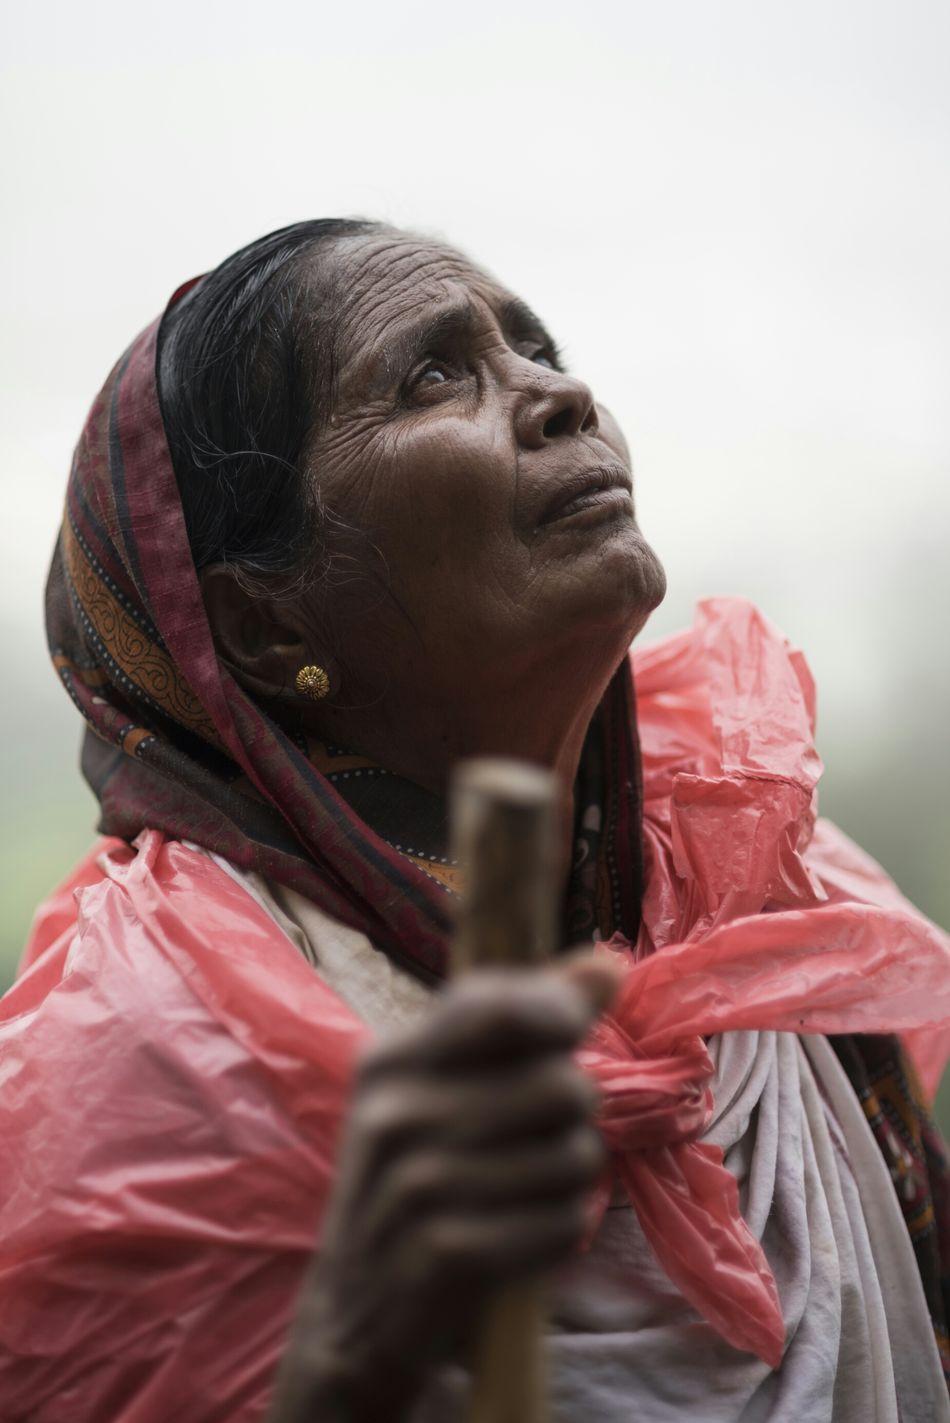 A devotee at Ganga Dwar, Trimbakeshwar. Showcase: December Nashik Trimbakeshwar Kumbhmela People Old Woman India Prayer Rain Waiting The Portraitist - 2016 EyeEm Awards